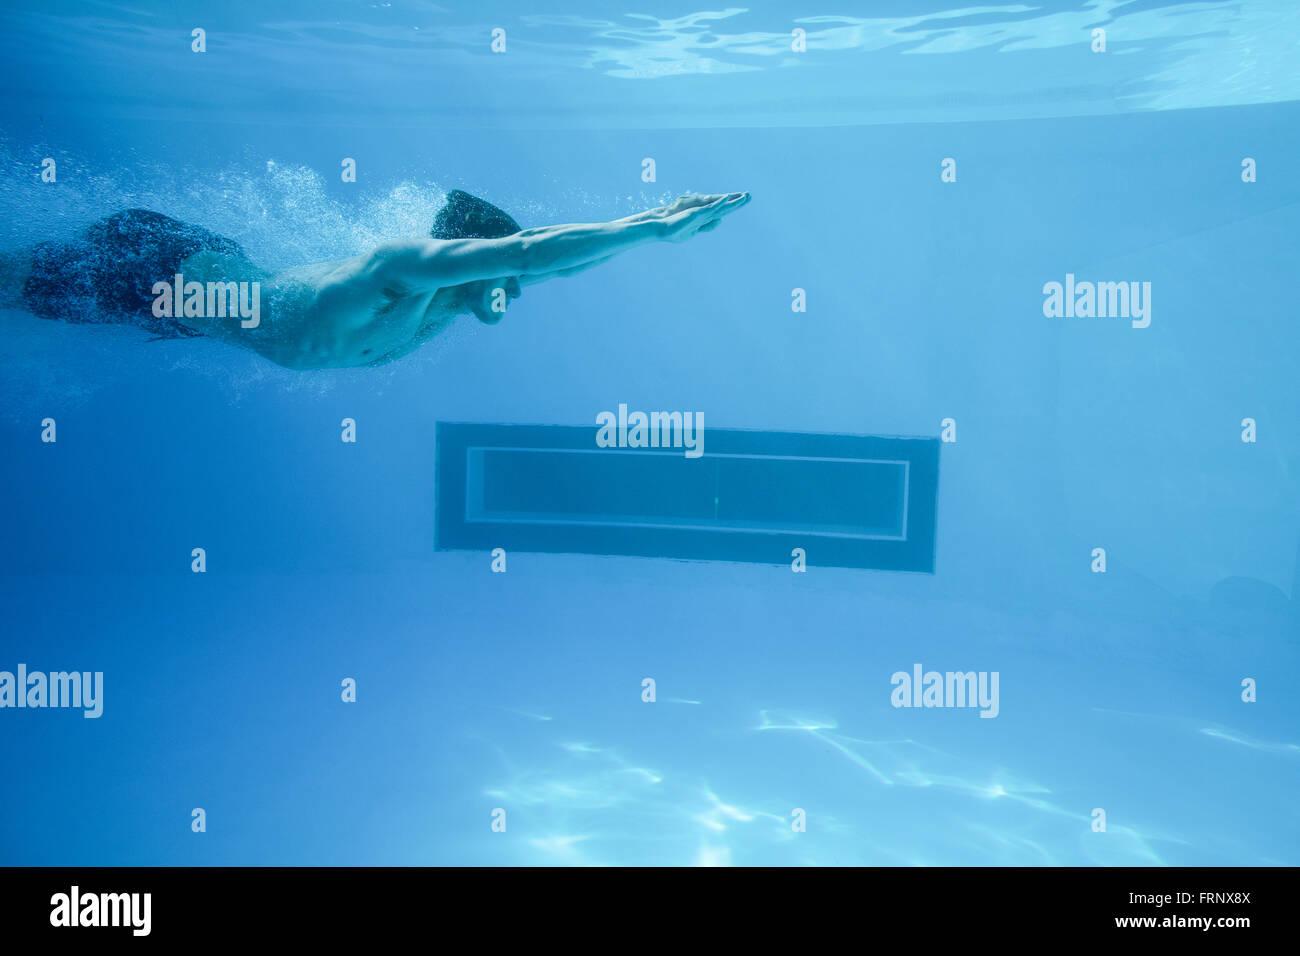 Man swimming underwater at resort - Stock Image